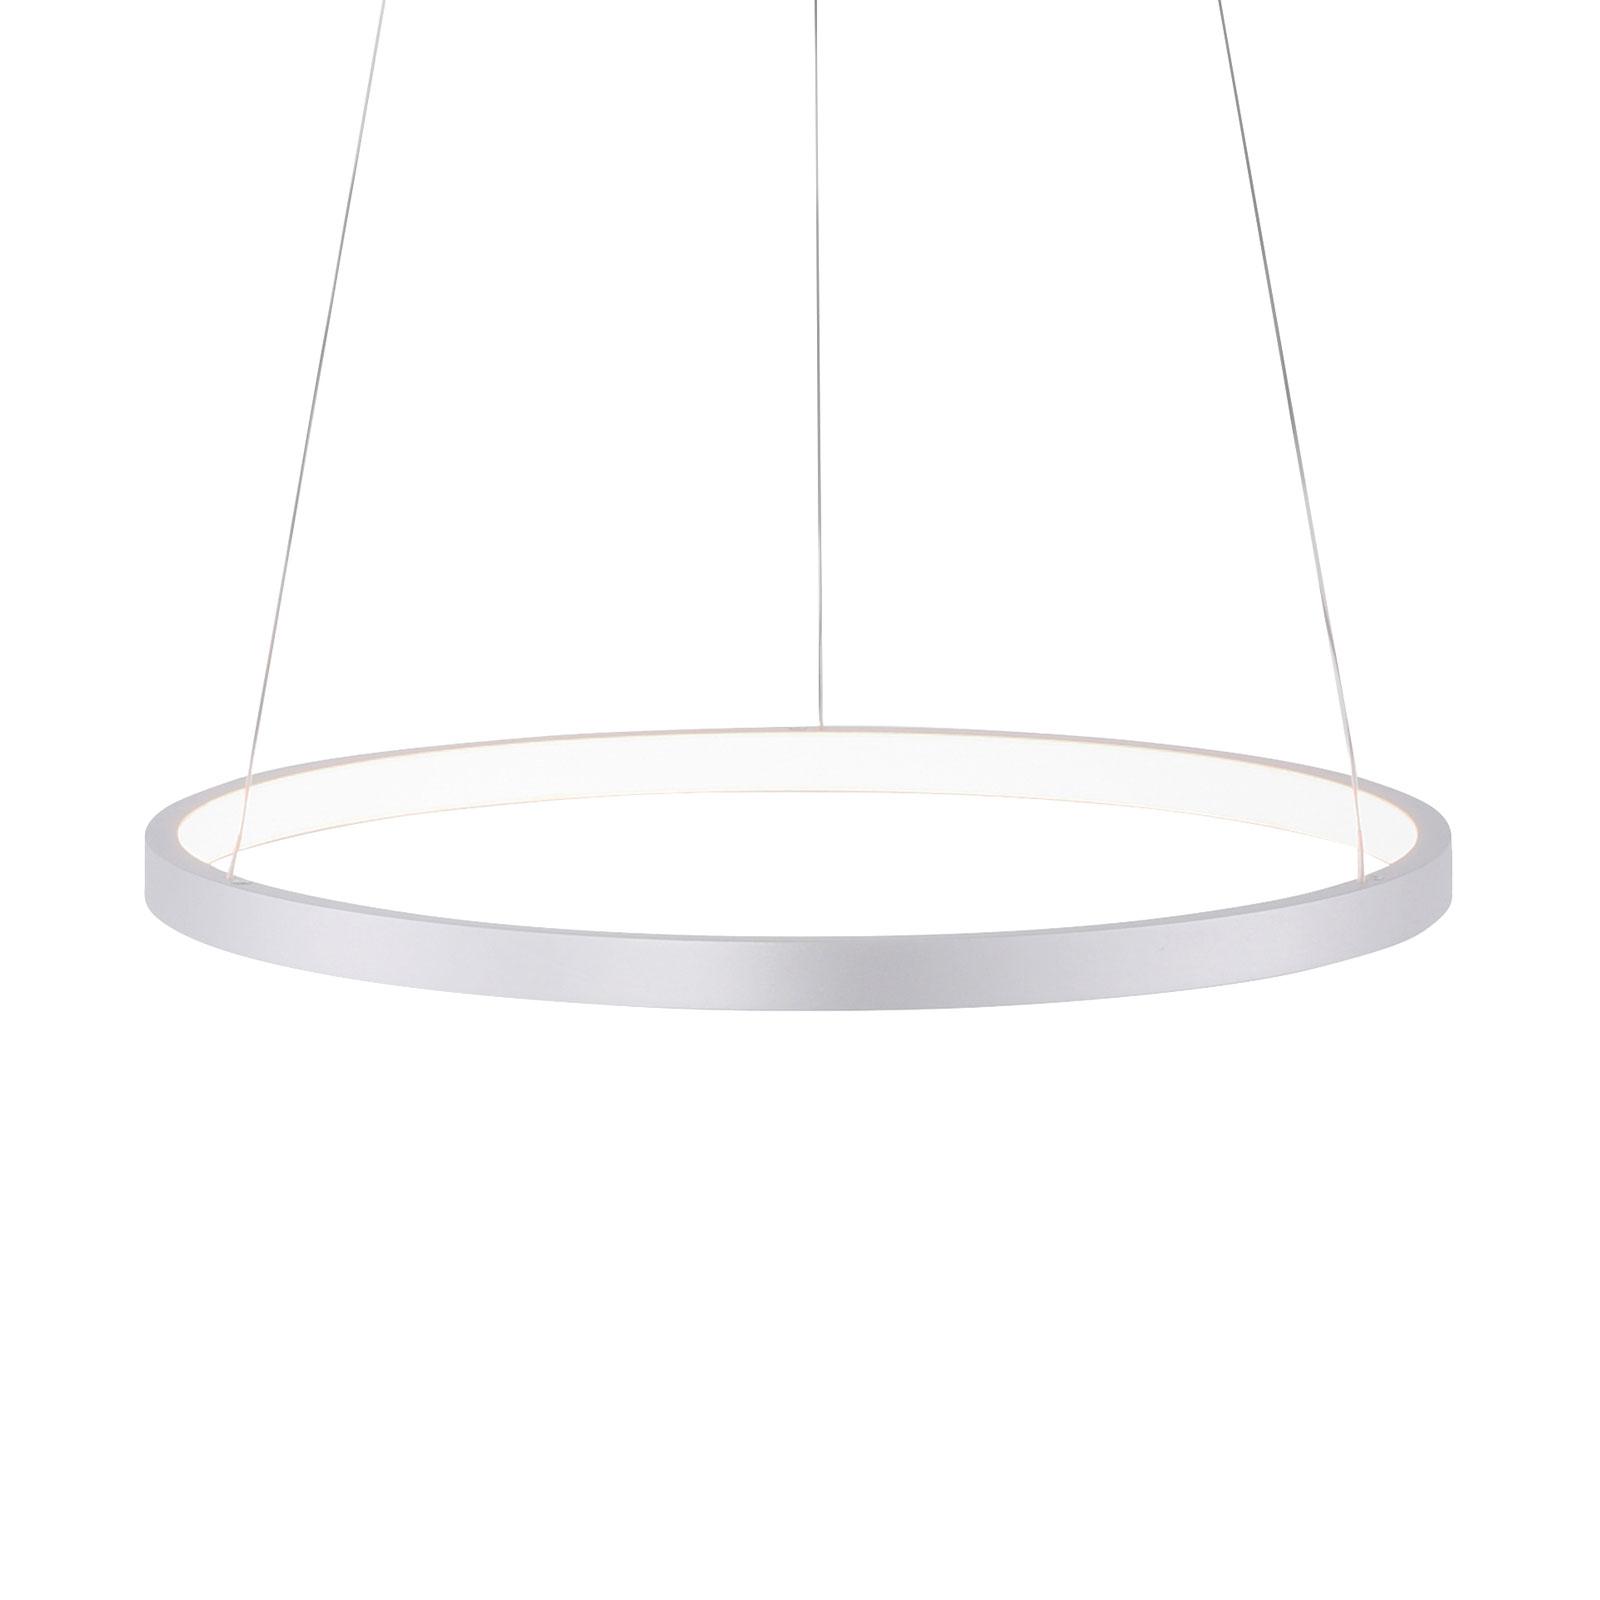 Lampa wisząca LED Circle, srebrna, Ø 39 cm